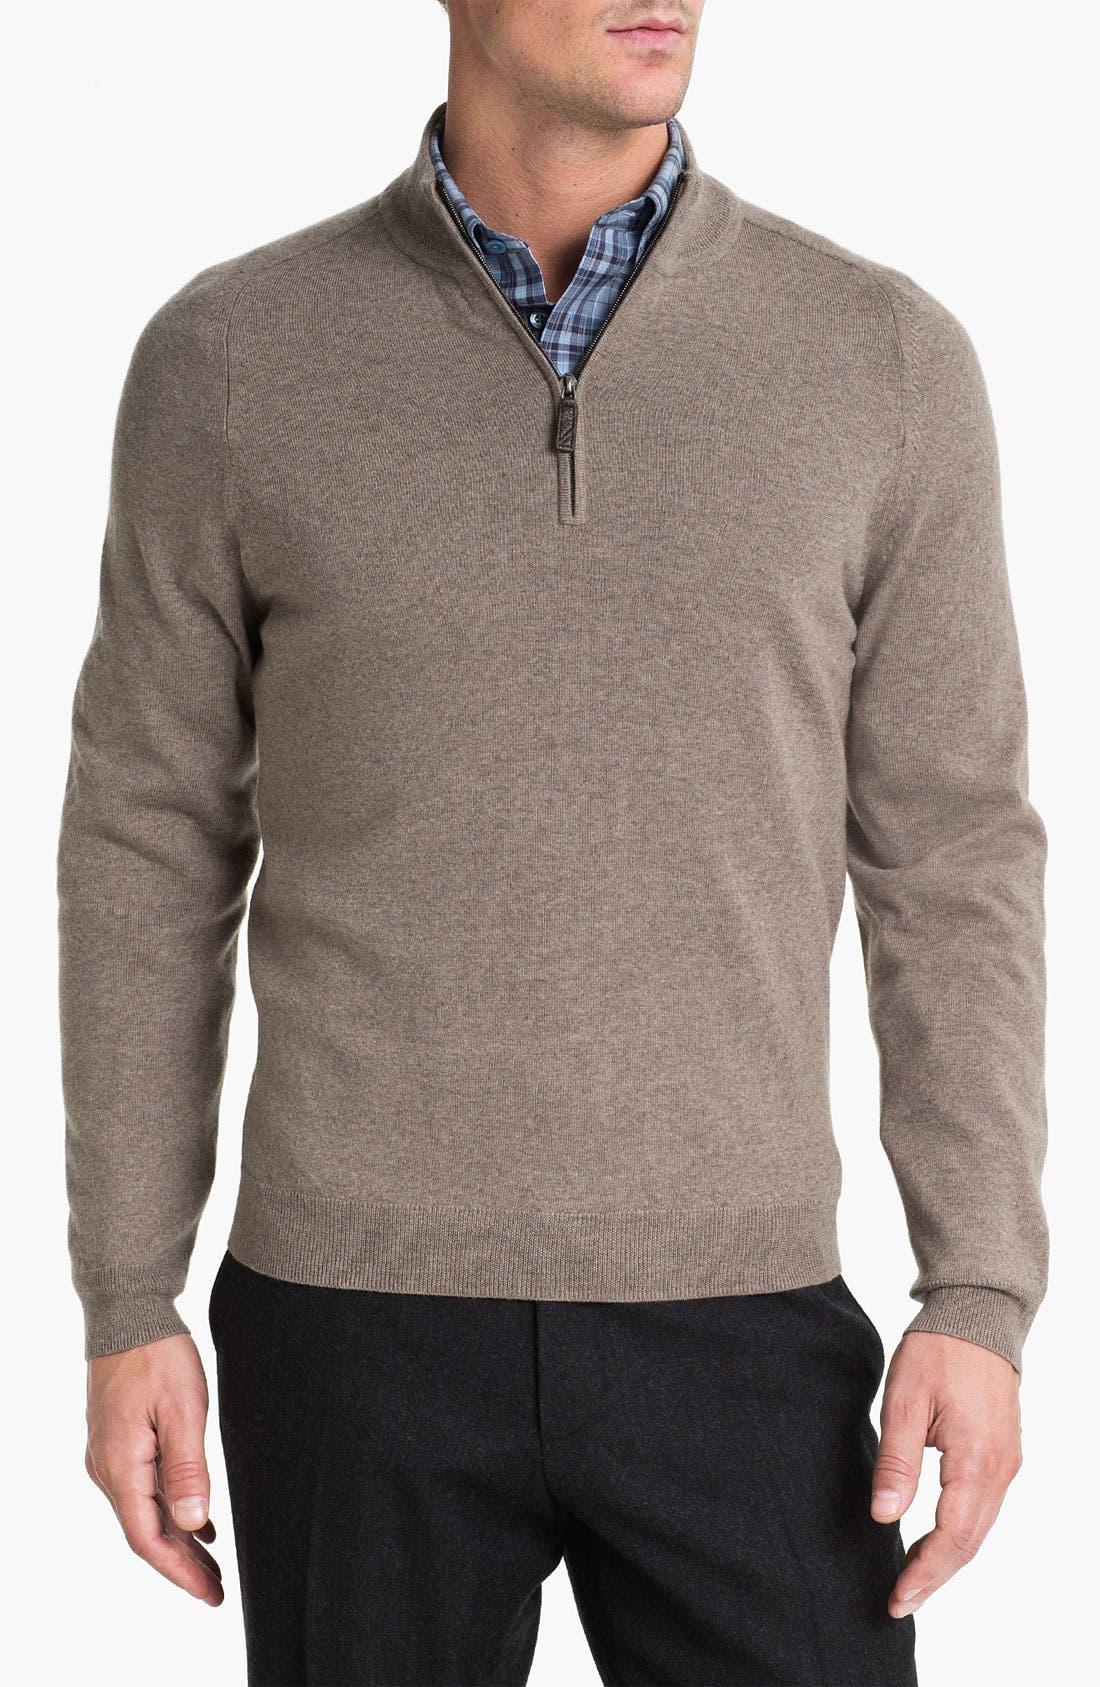 Main Image - Nordstrom Merino Wool Half Zip Sweater